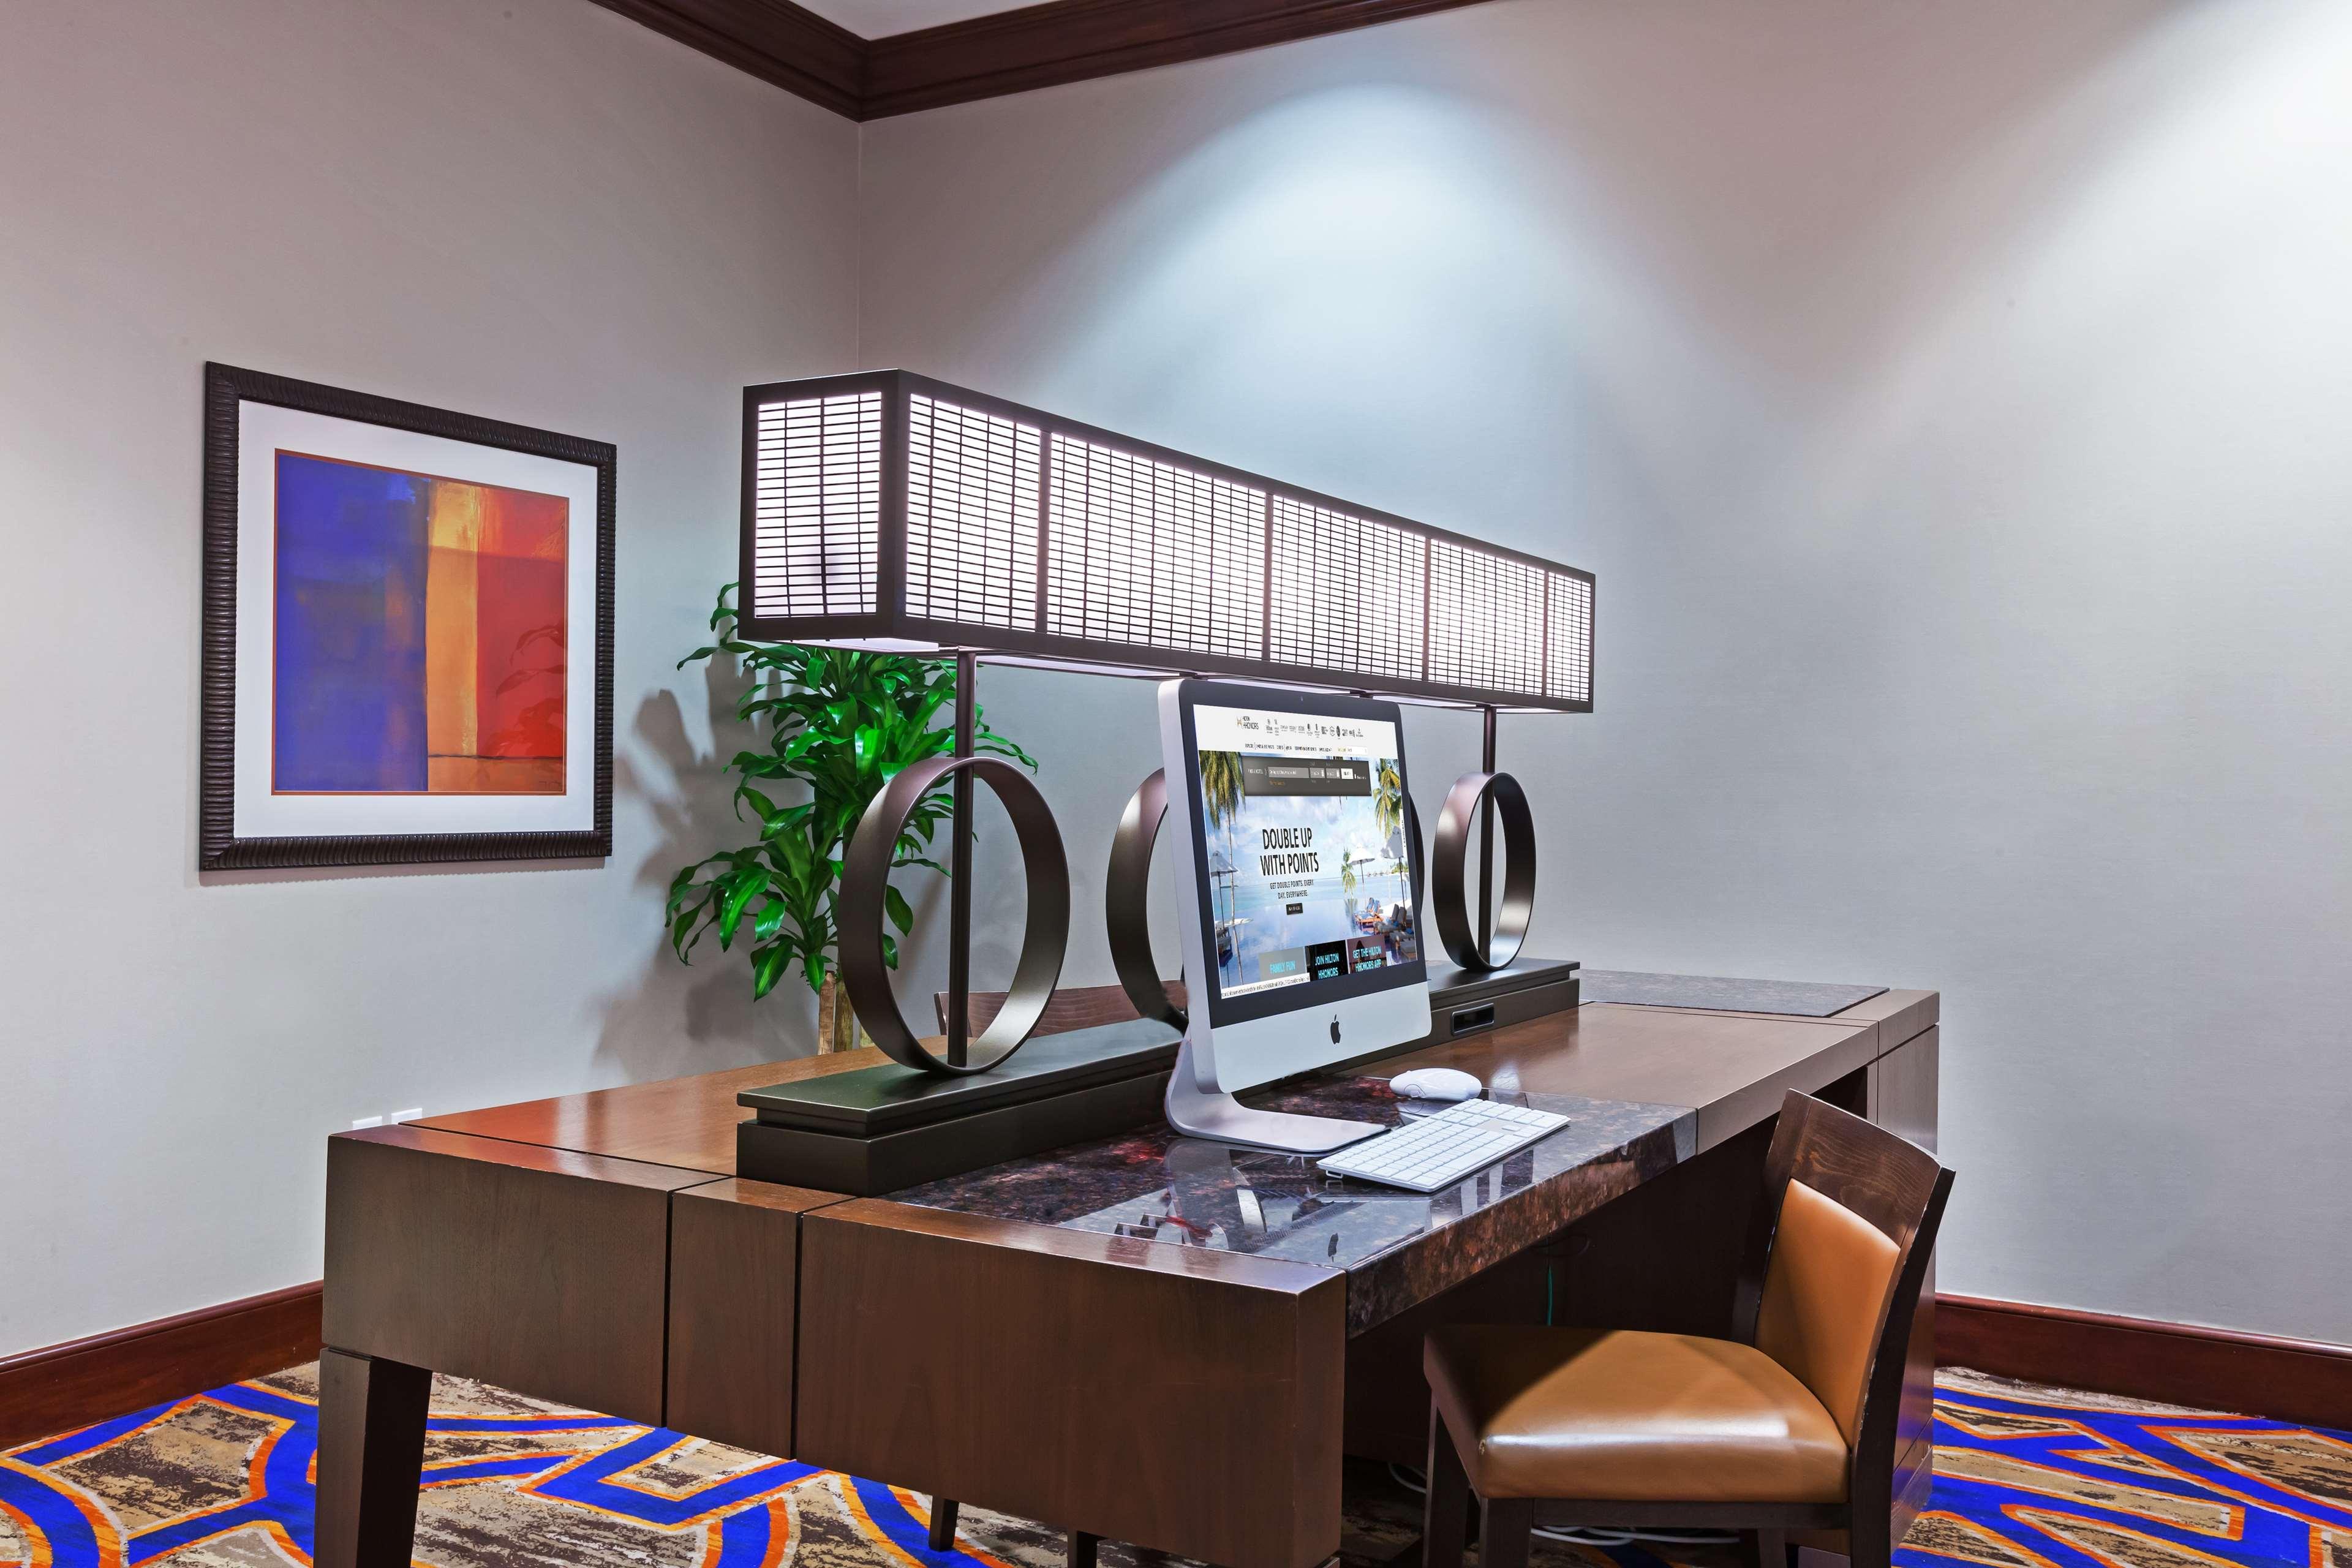 Hilton Waco image 66